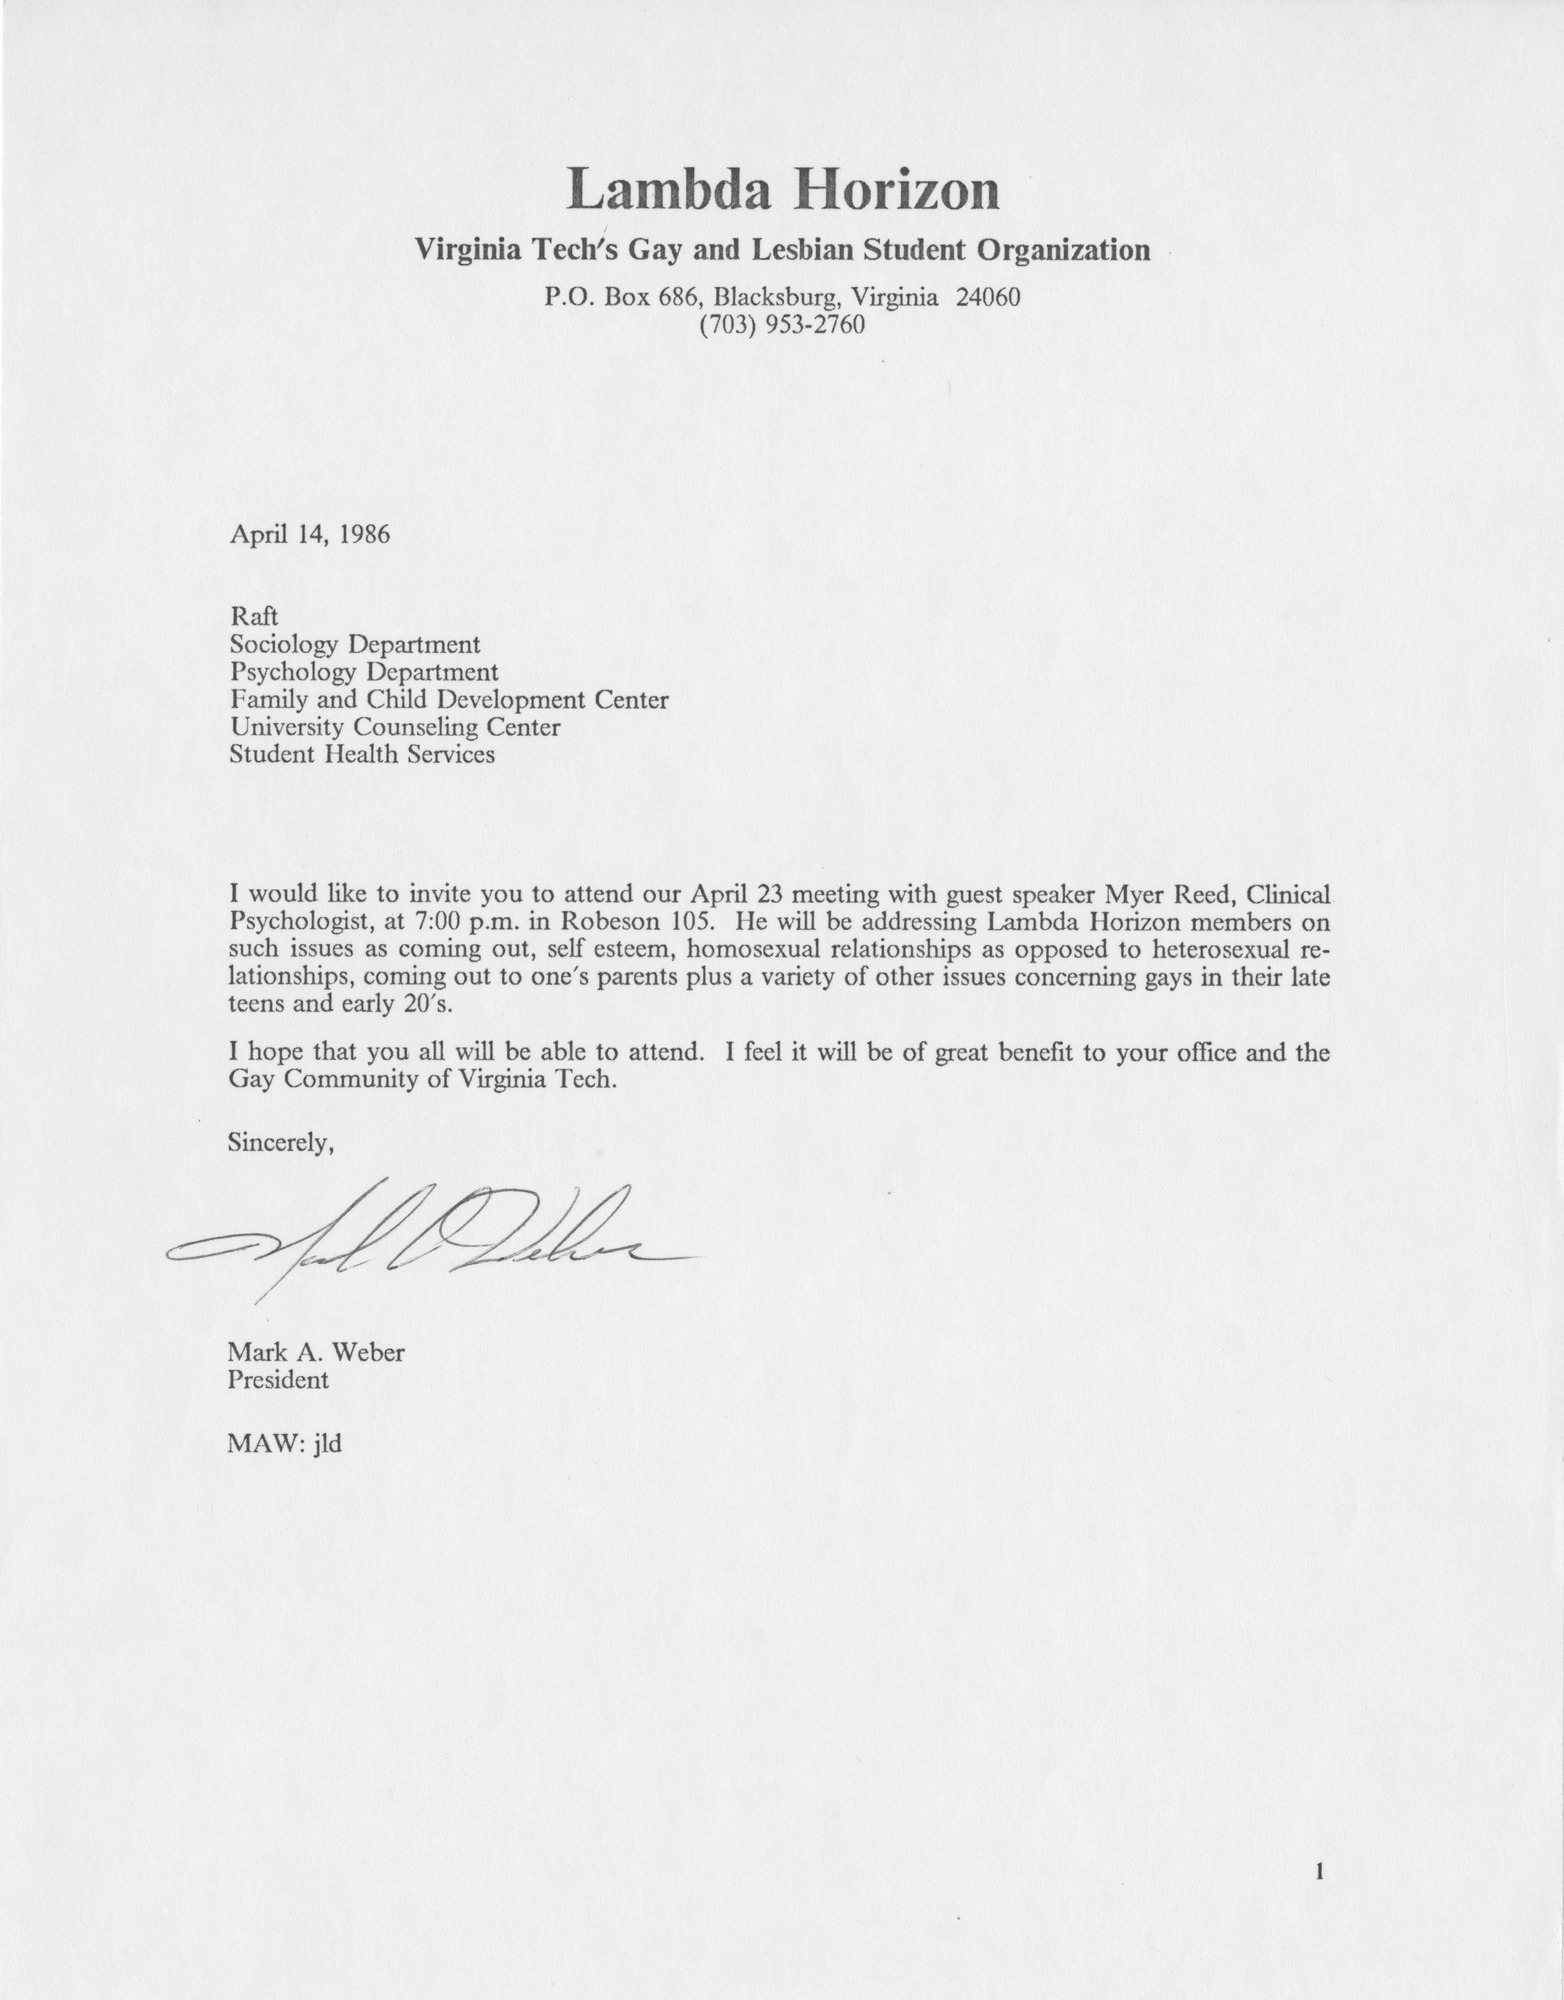 Ms2014-010_WeberMark_CorrespondenceMyerReed_1986_0414.jpg